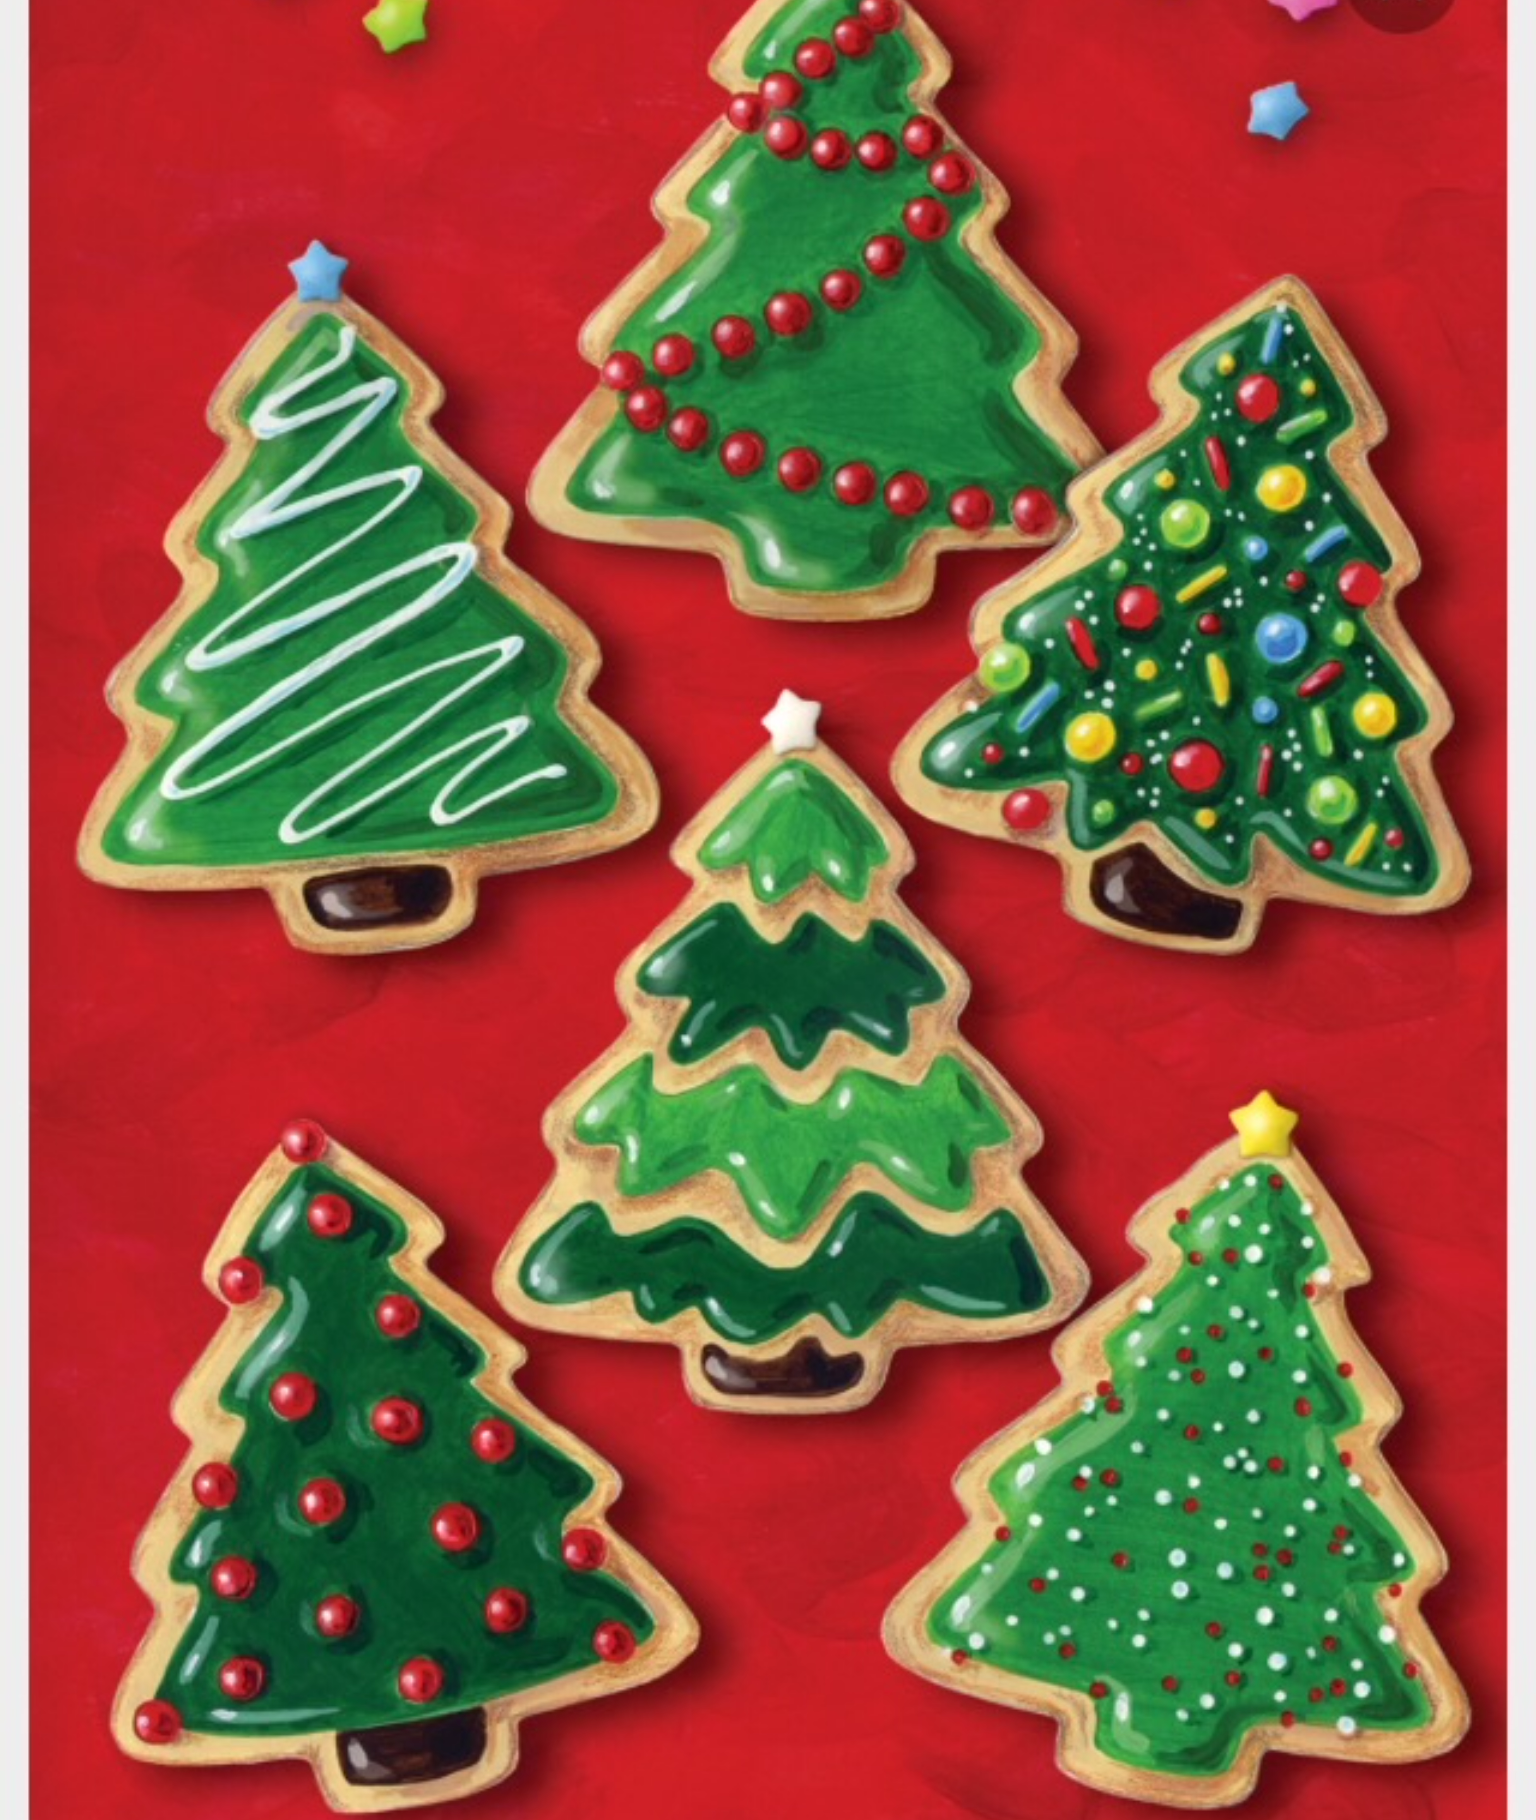 Pin by Phoebe Sinclair on Christmas food | Pinterest | Sugar cookies ...